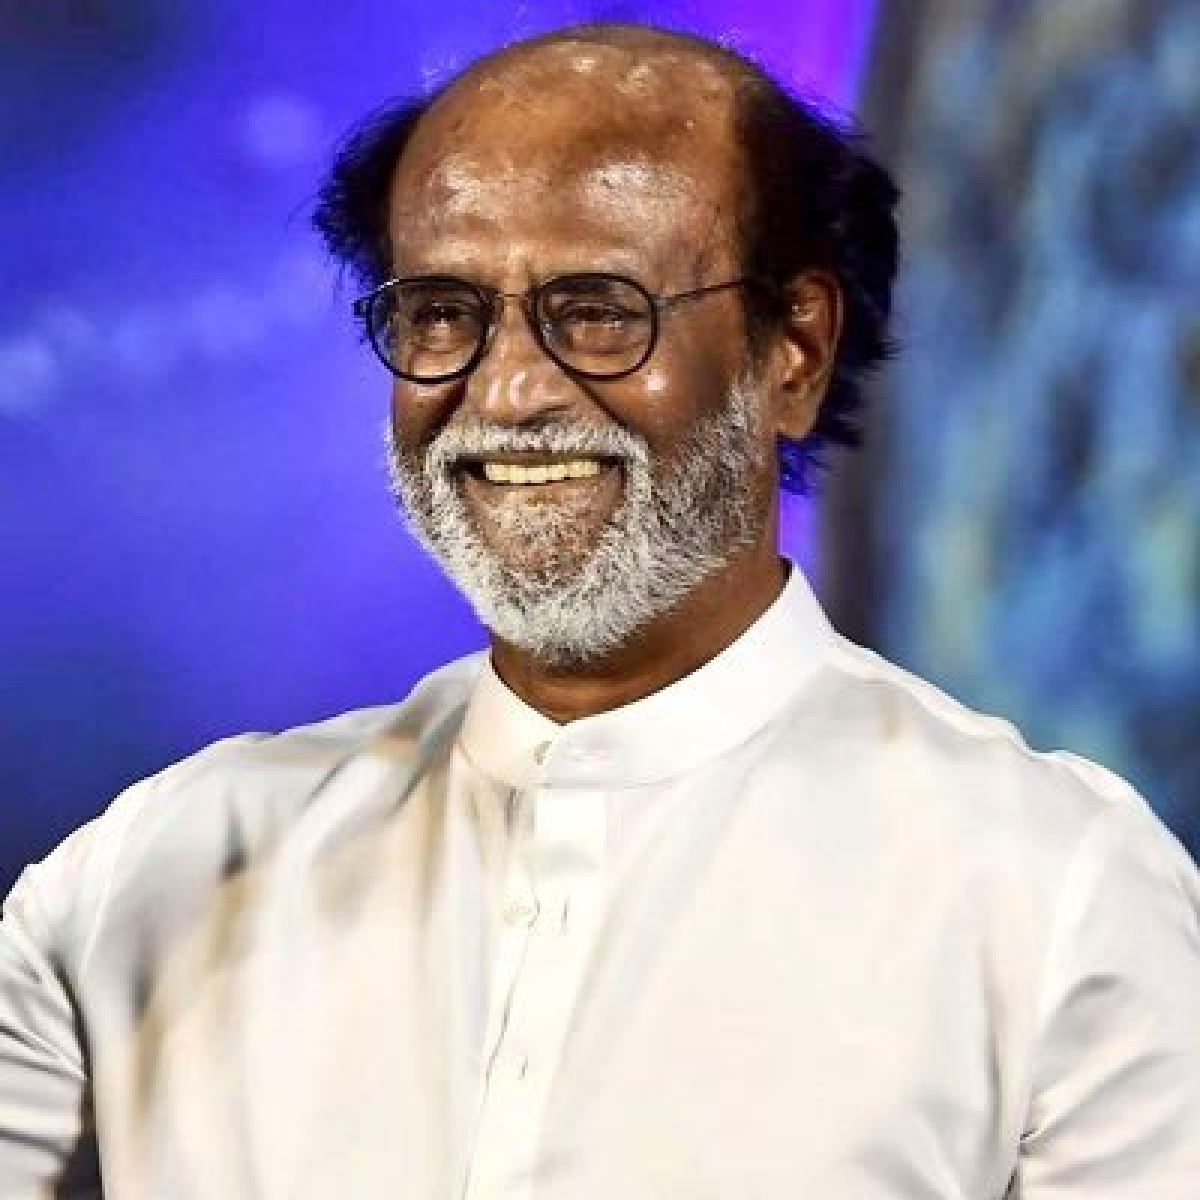 Rajnikanth to float political party by May-June, says close aide K Thiyagarajan